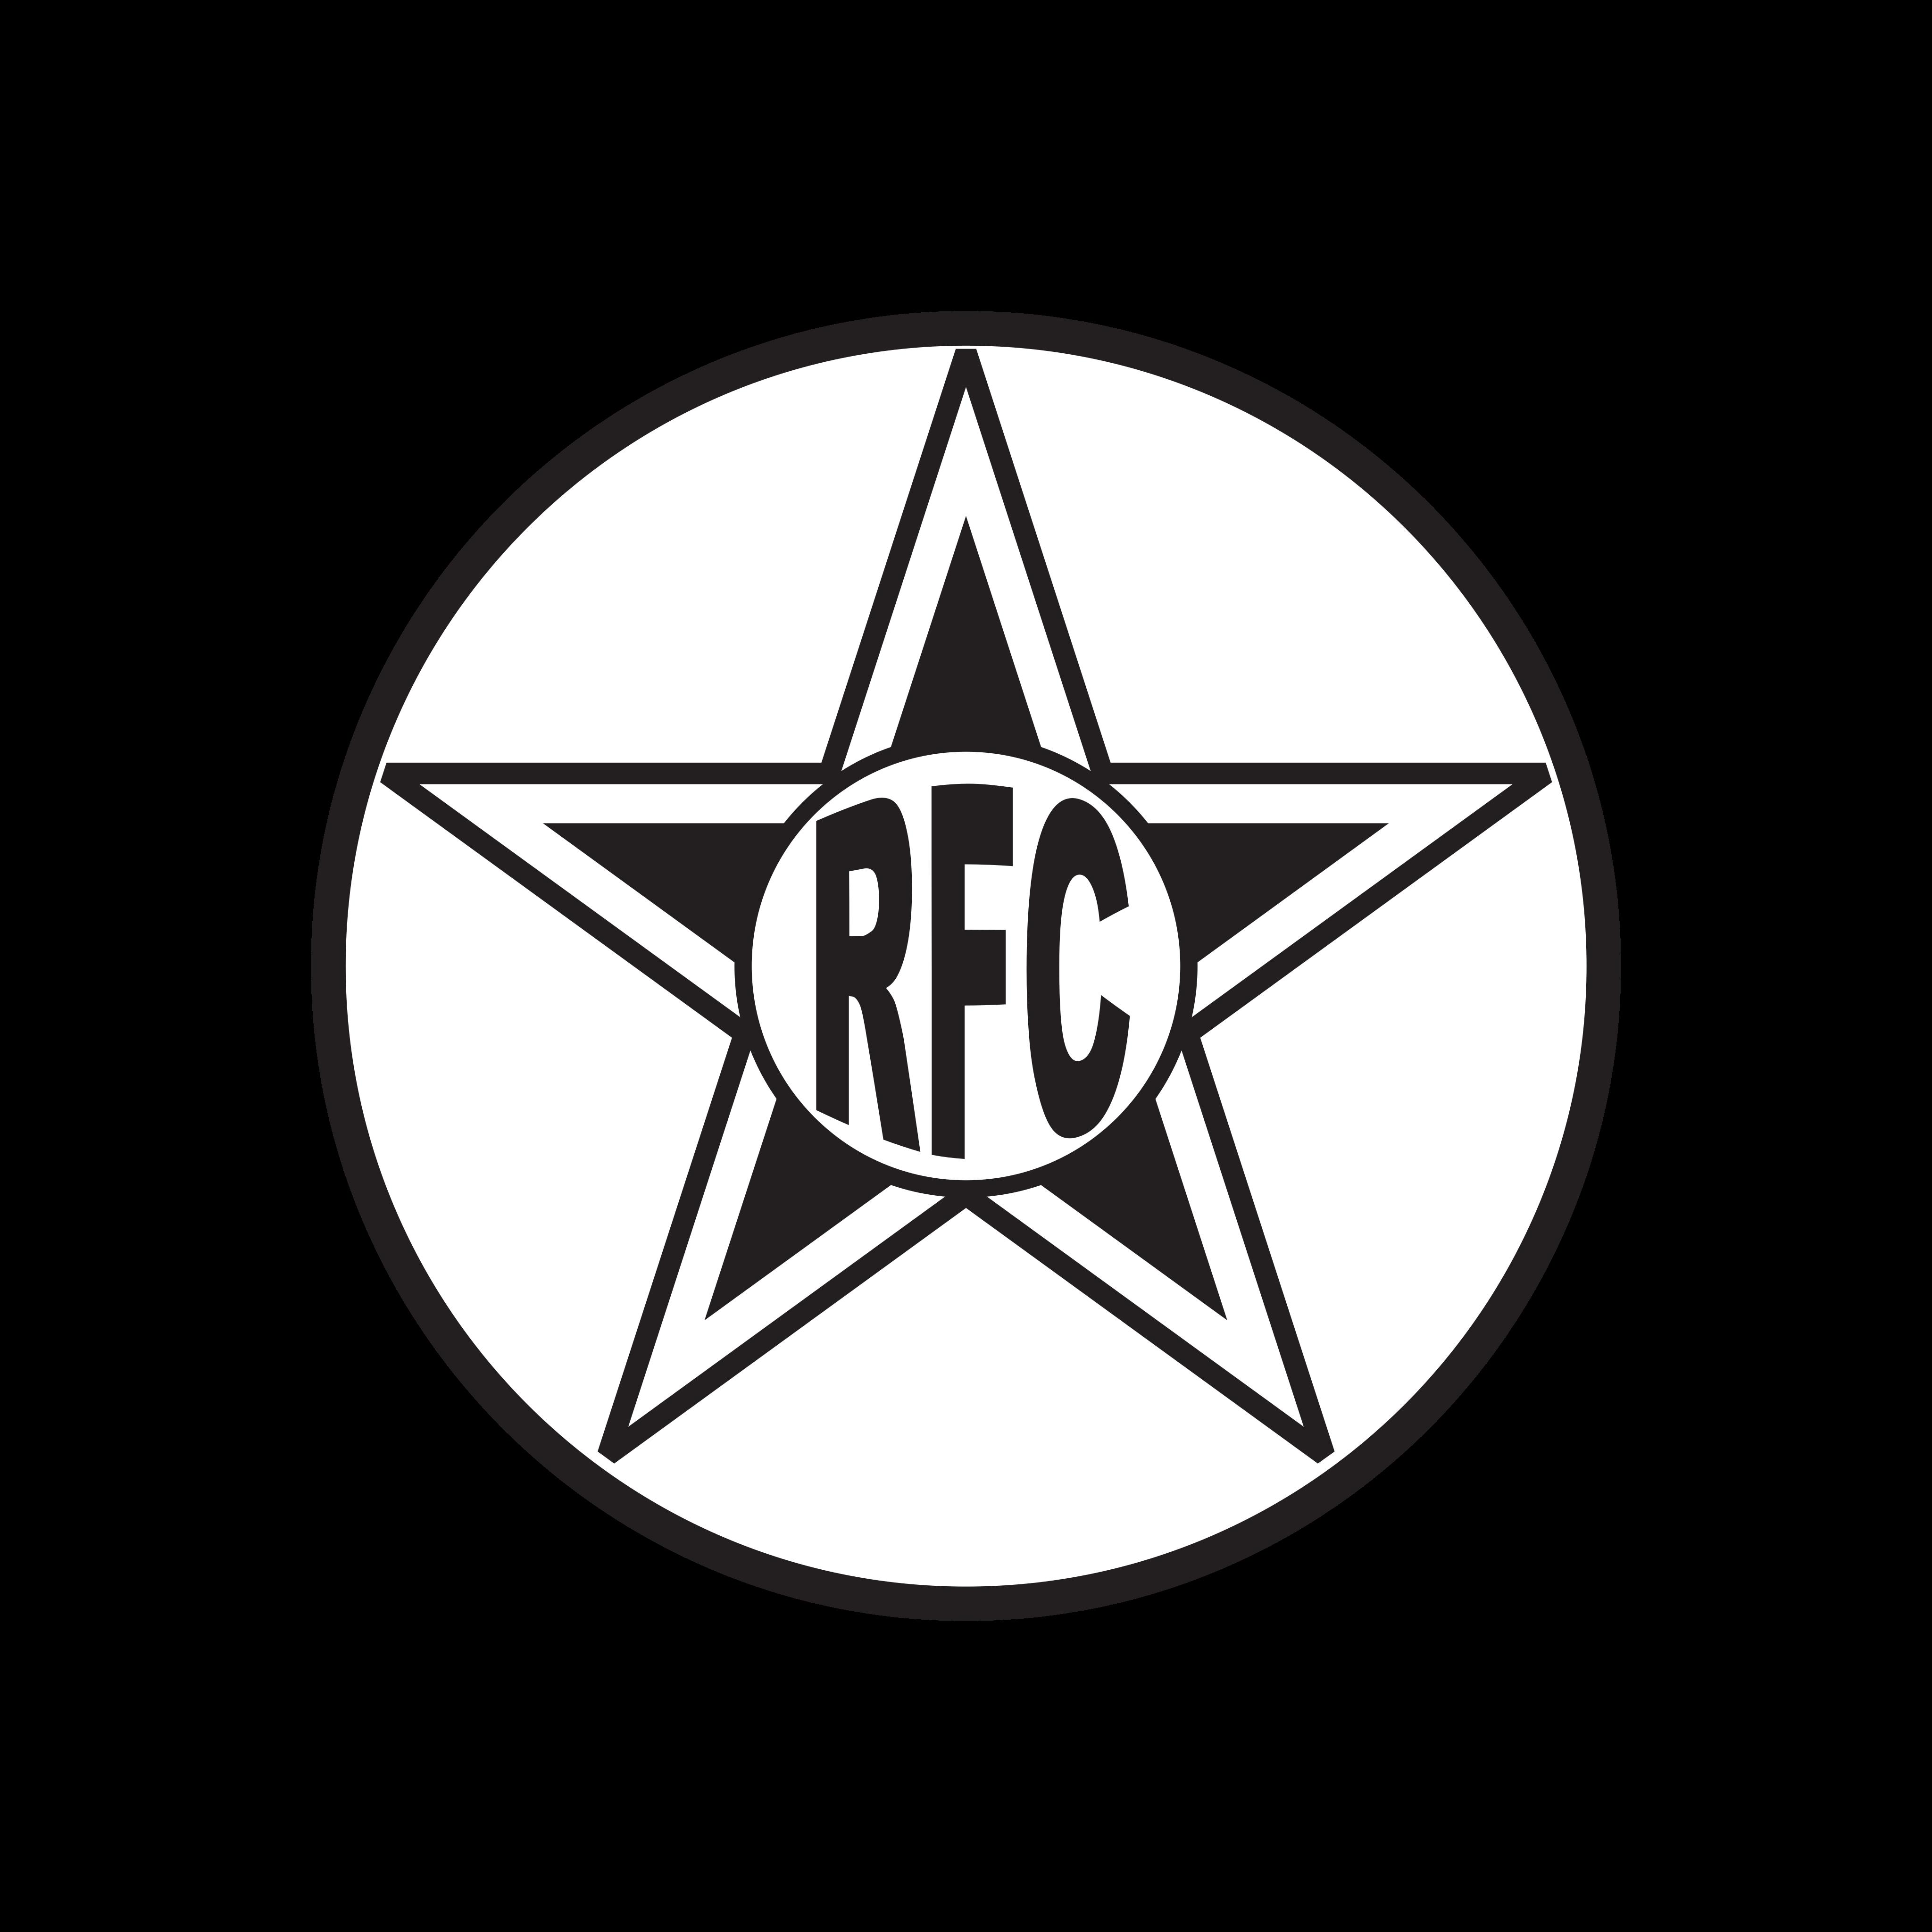 resende fc logo escudo 0 - Resende Logo - Resende Futebol Clube Escudo